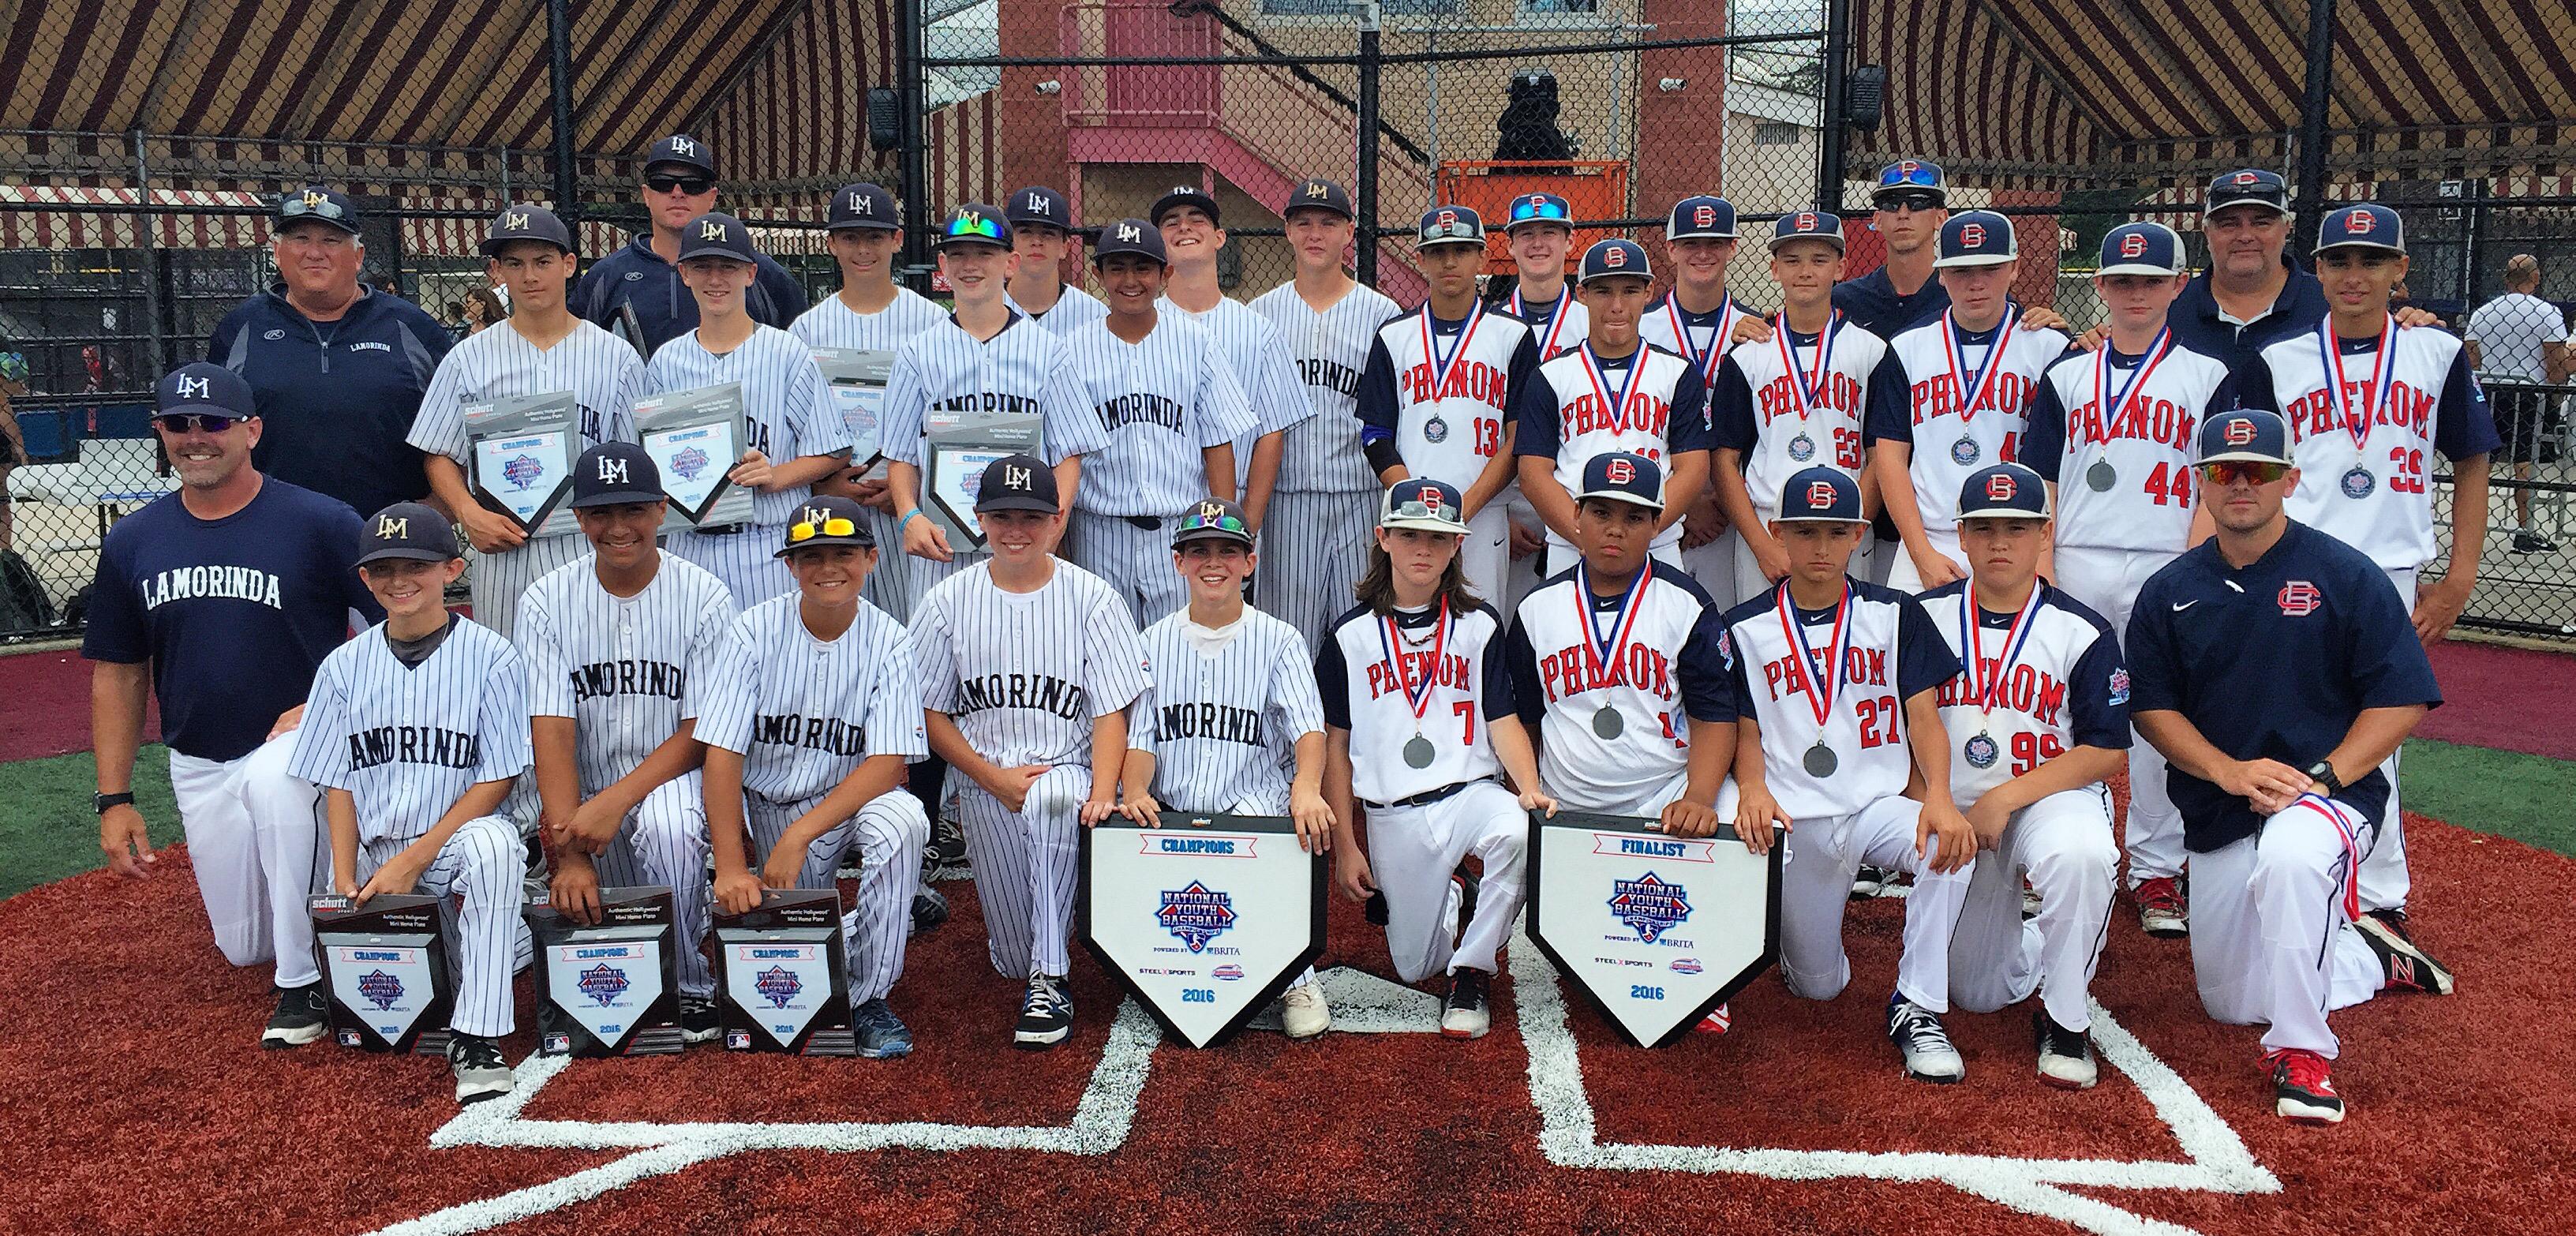 National Champions Crowned at 2016 NYBC